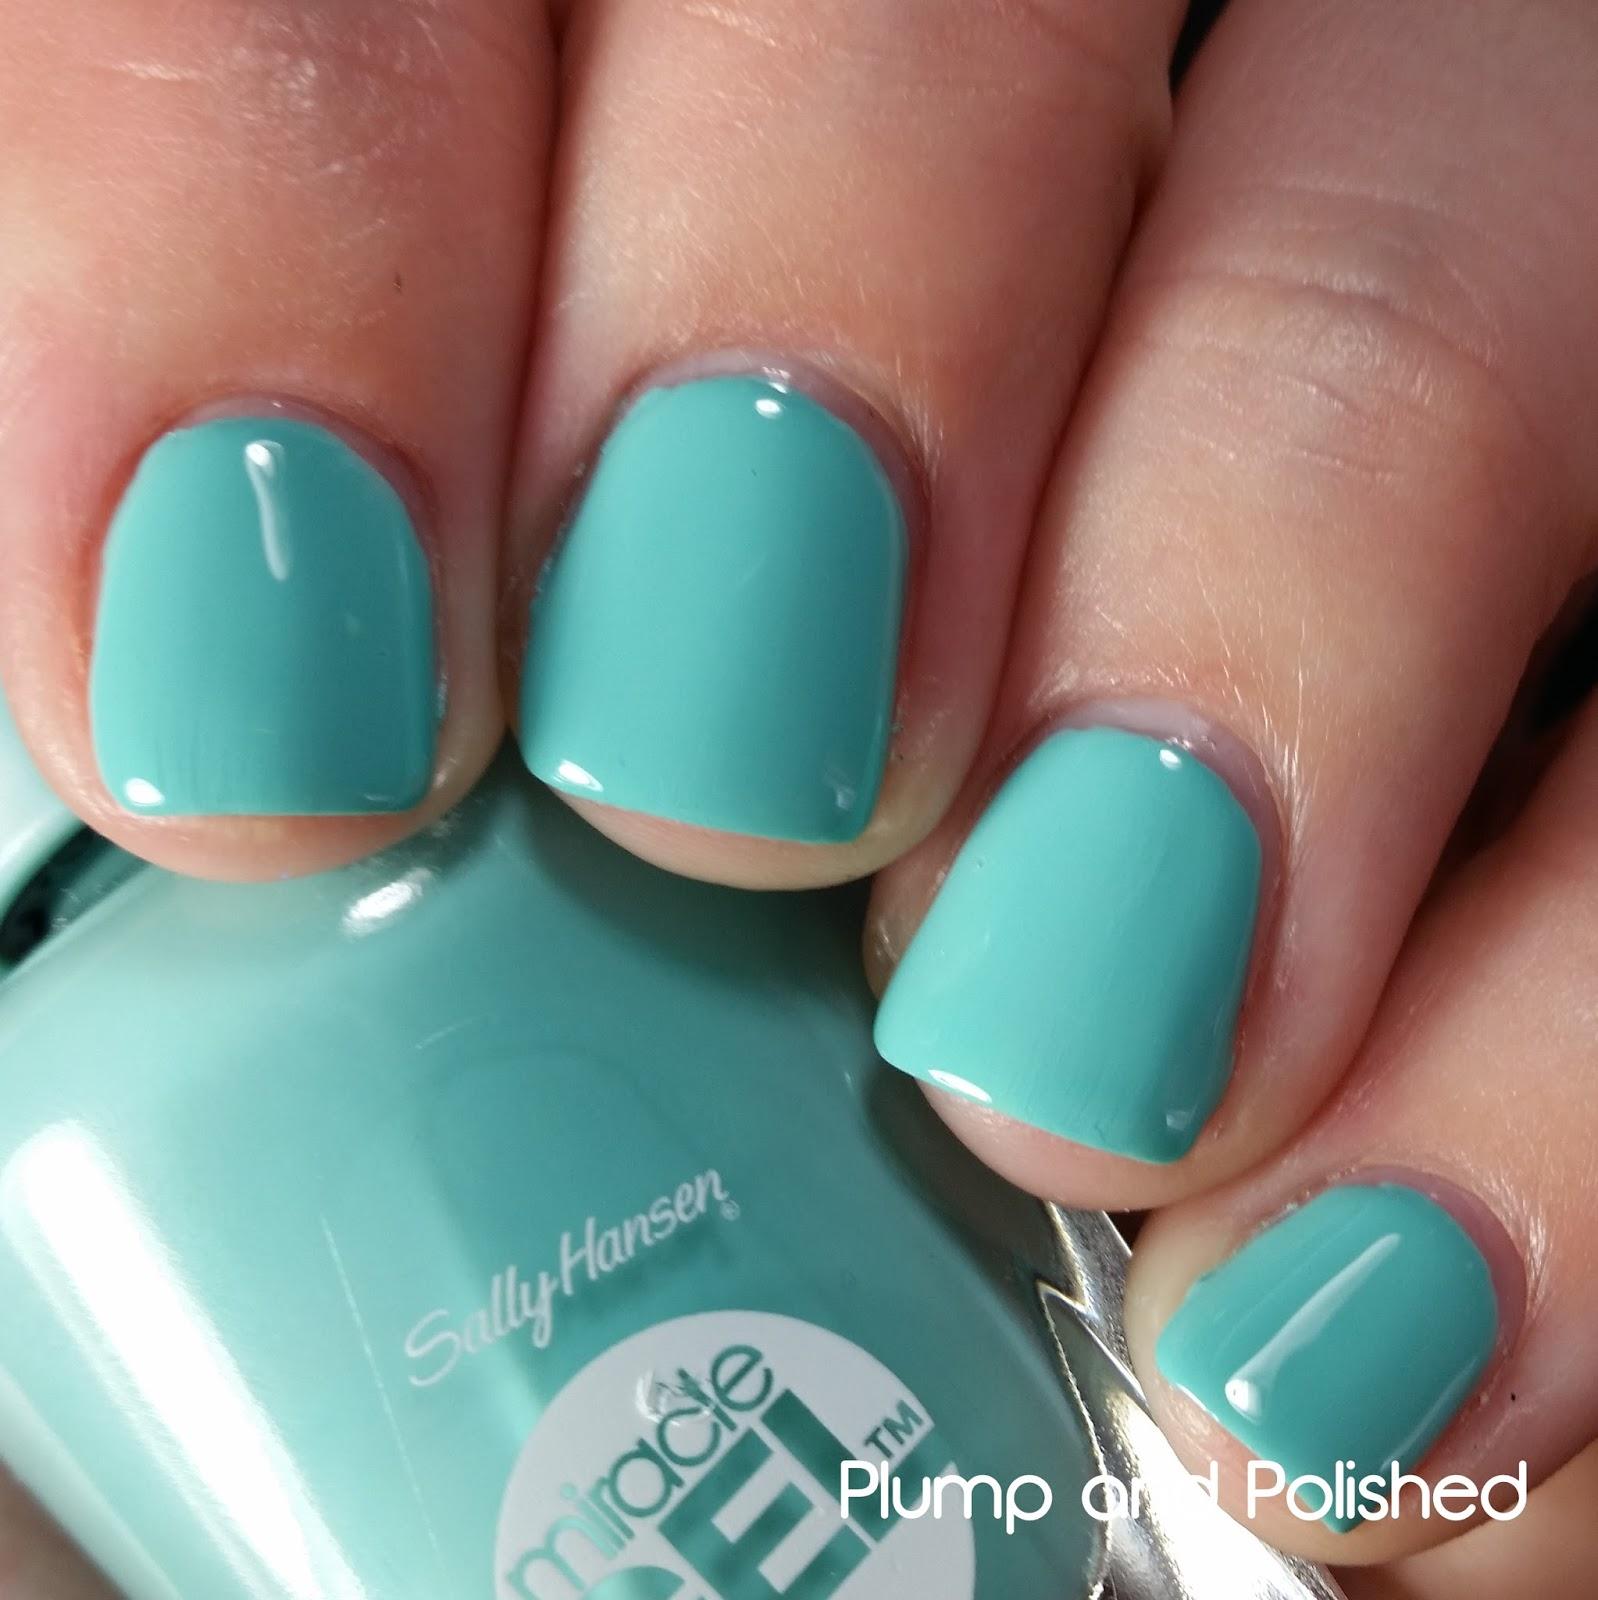 plump and polished: sally hansen - miracle gel polish